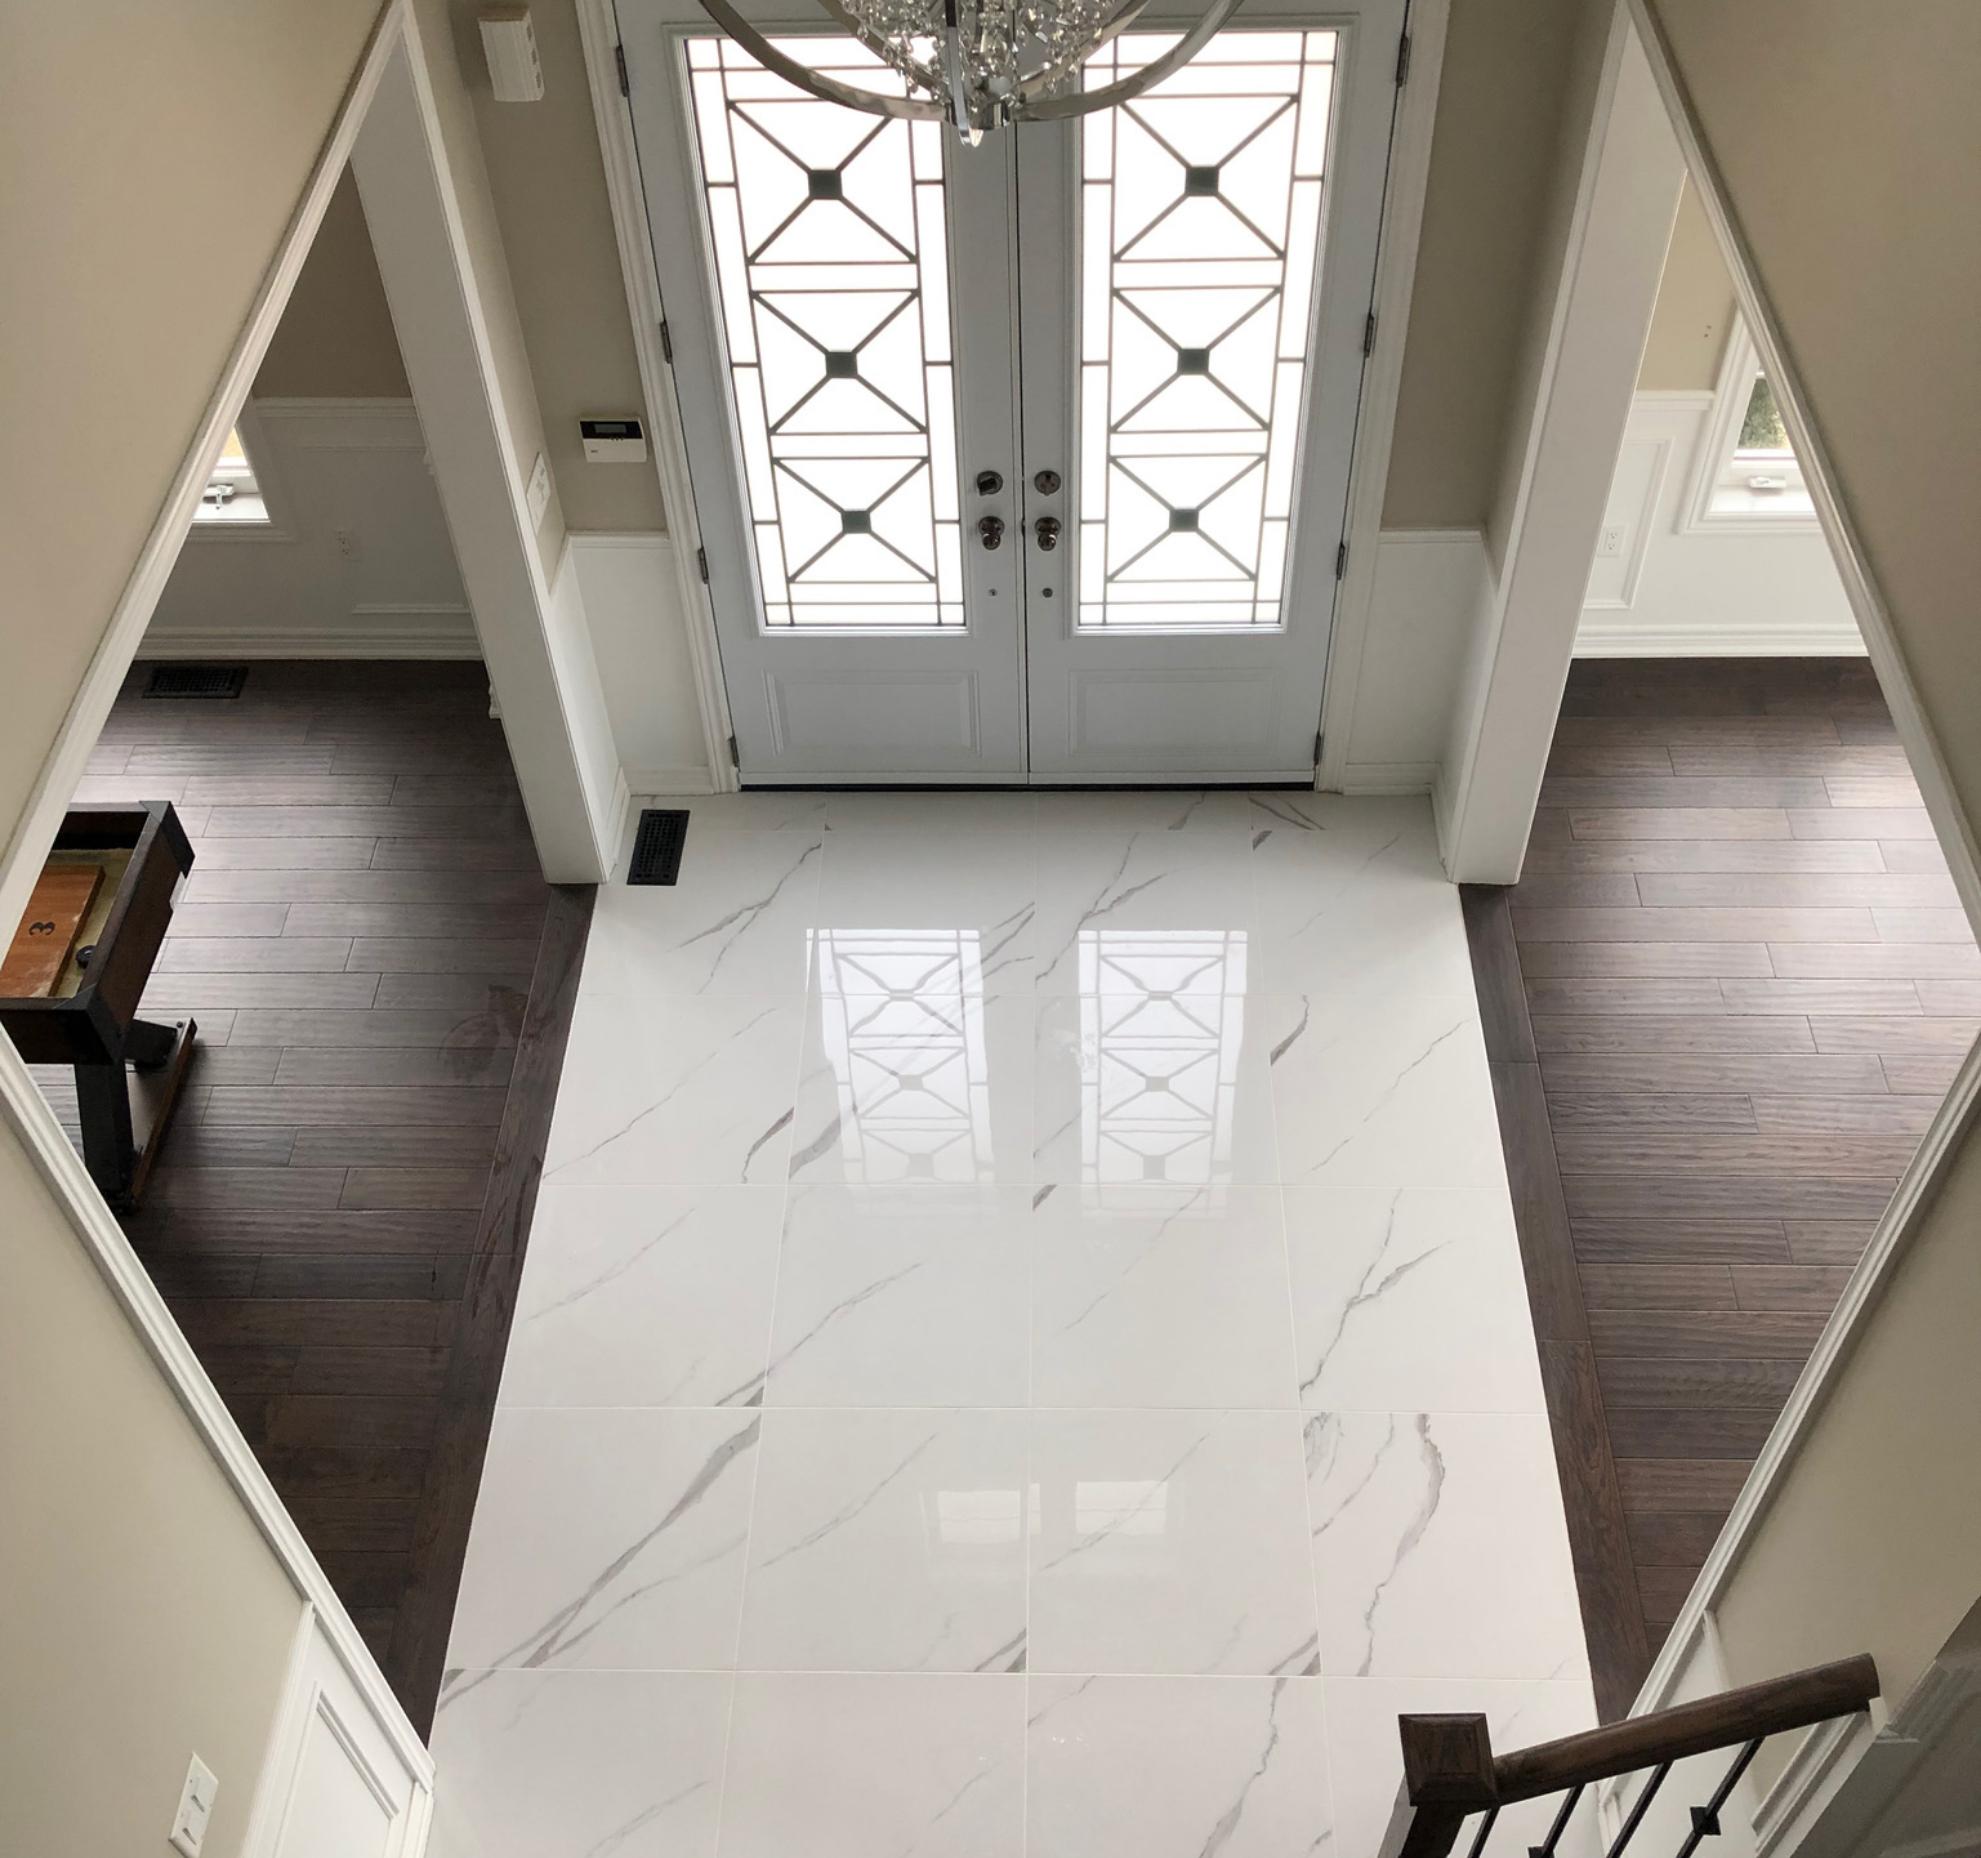 Shot of flooring and walls